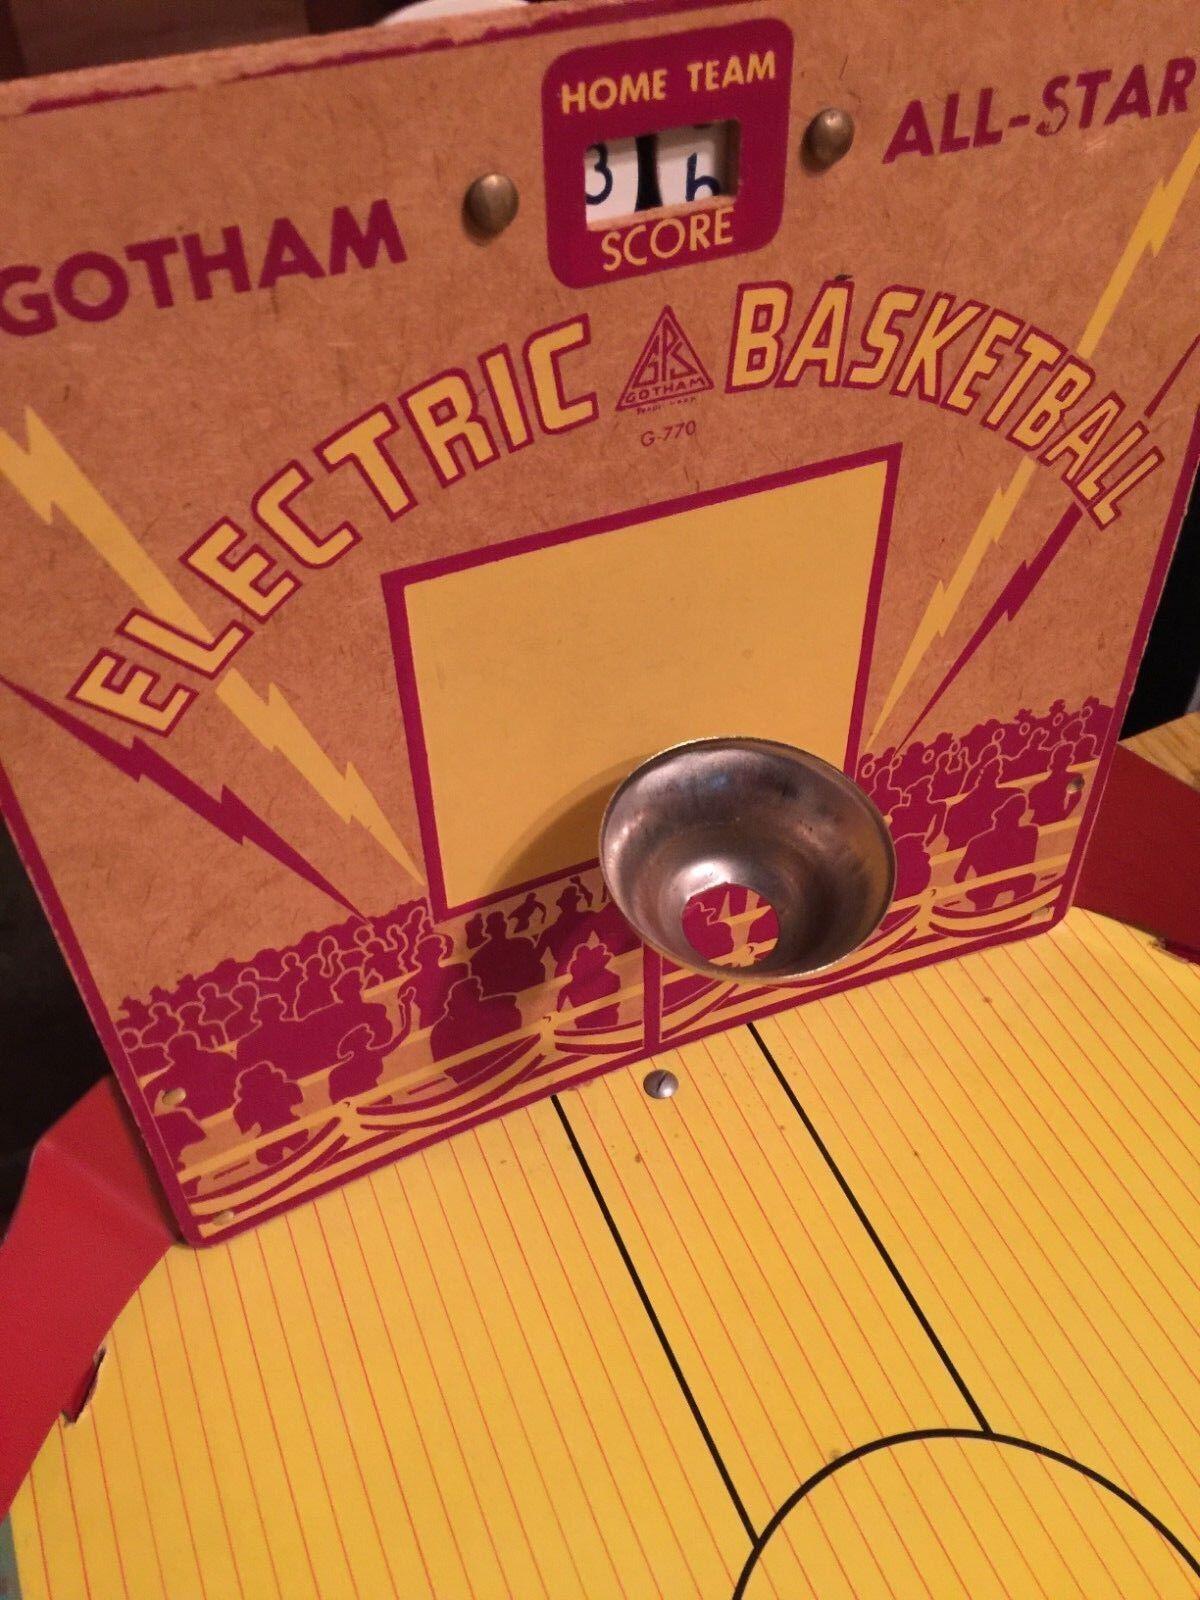 Gotham All-Star Vibrating BASKETBALL 1940's mint in original box box box no 770 6a6b66